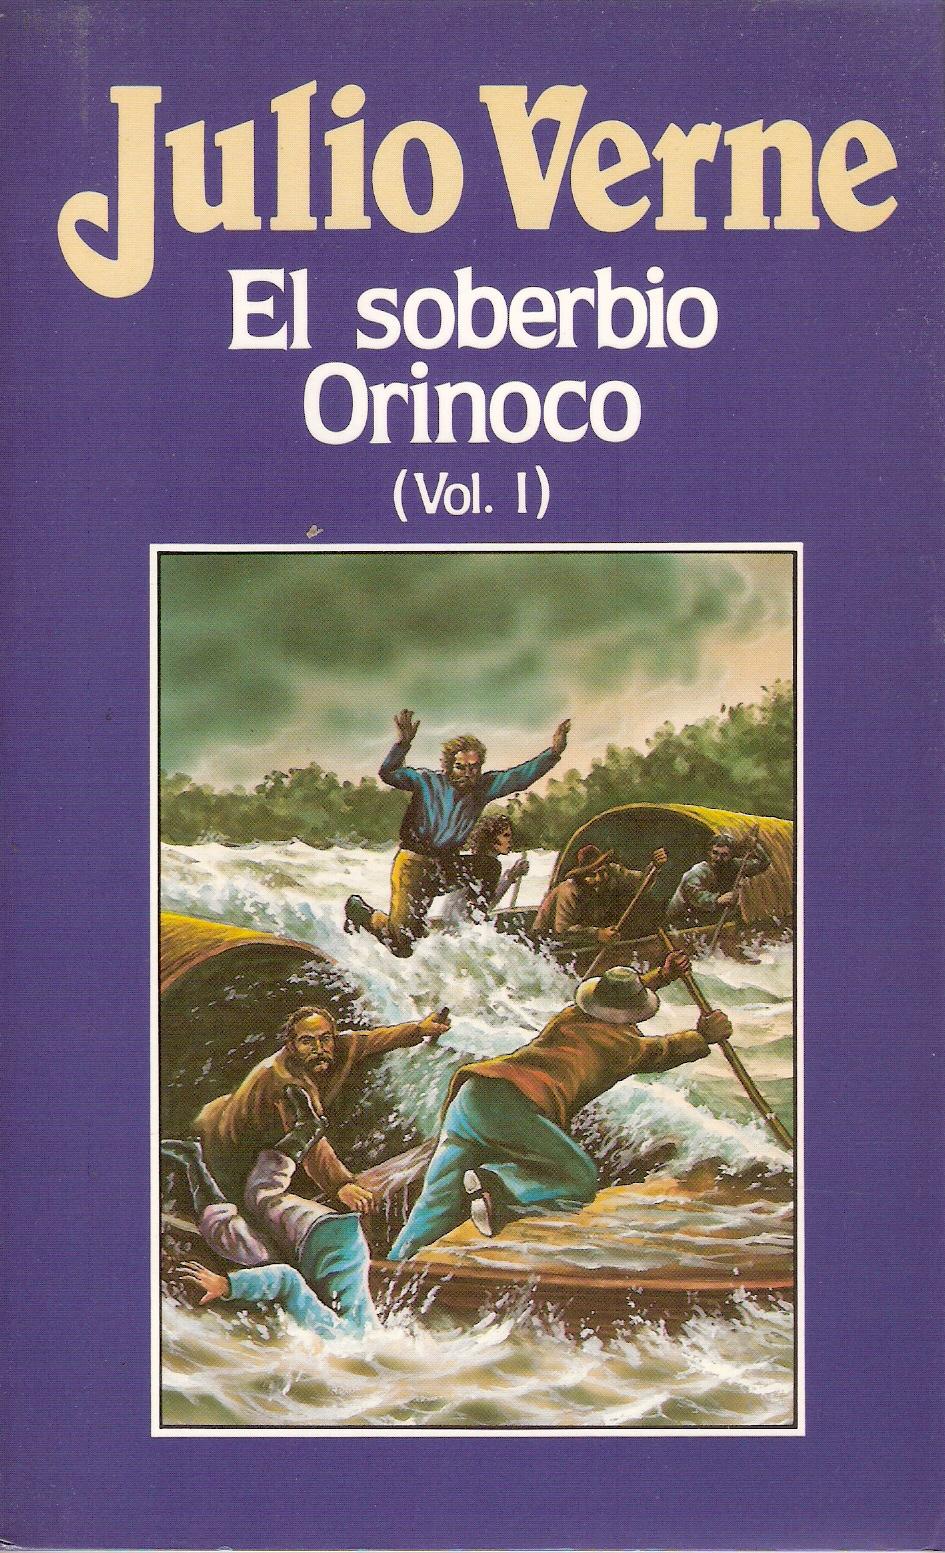 El soberbio Orinoco I